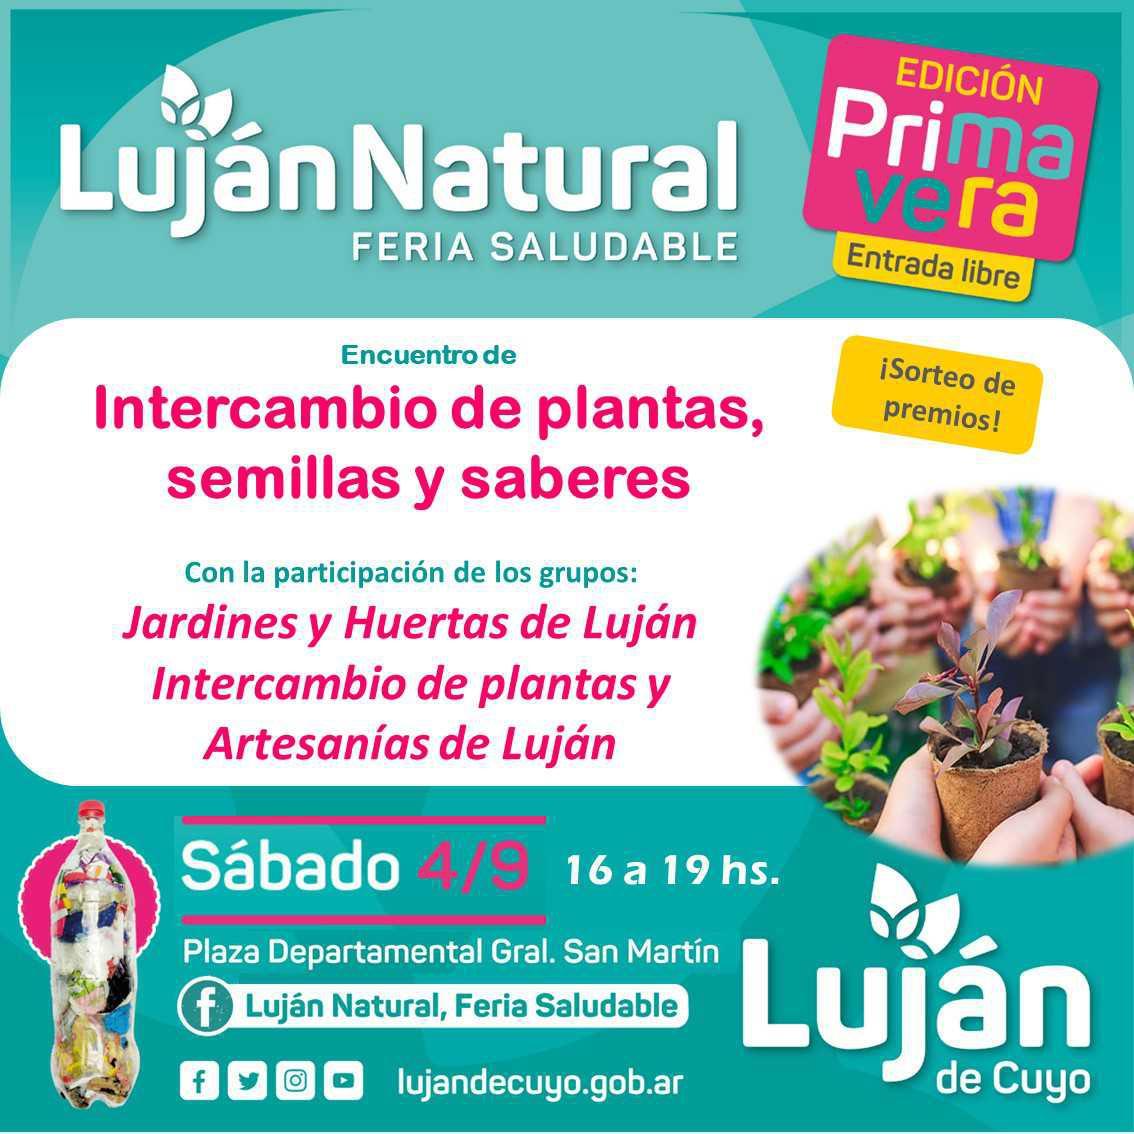 Se viene otra Feria de Luján Natural